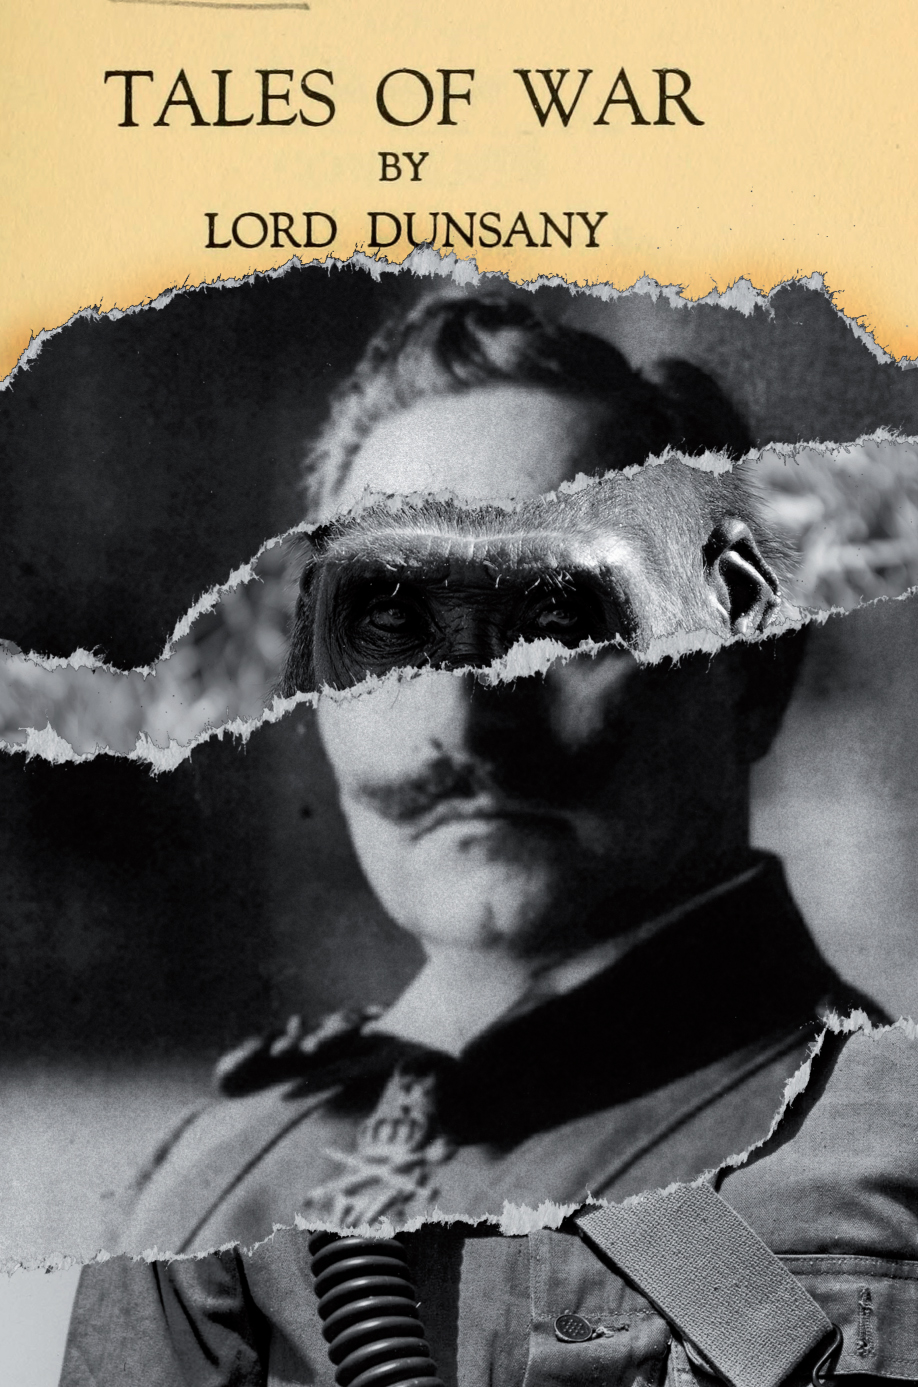 Nesse momento - Livro - Página 2 Dunsany+Tales+of+War+cover